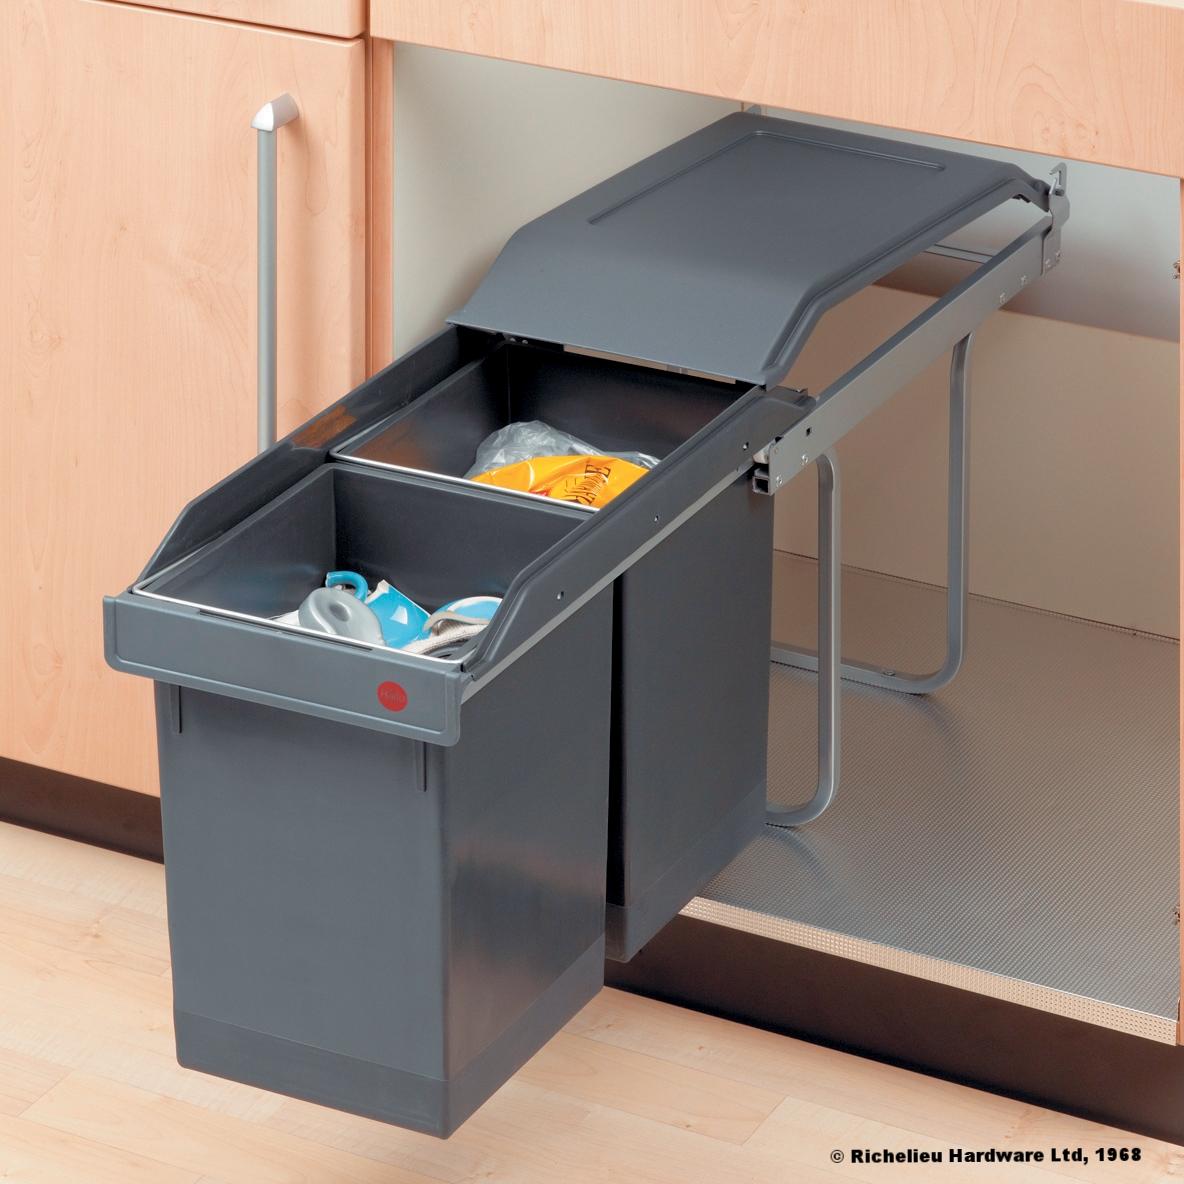 Richelieu Plastic Sliding Waste bins